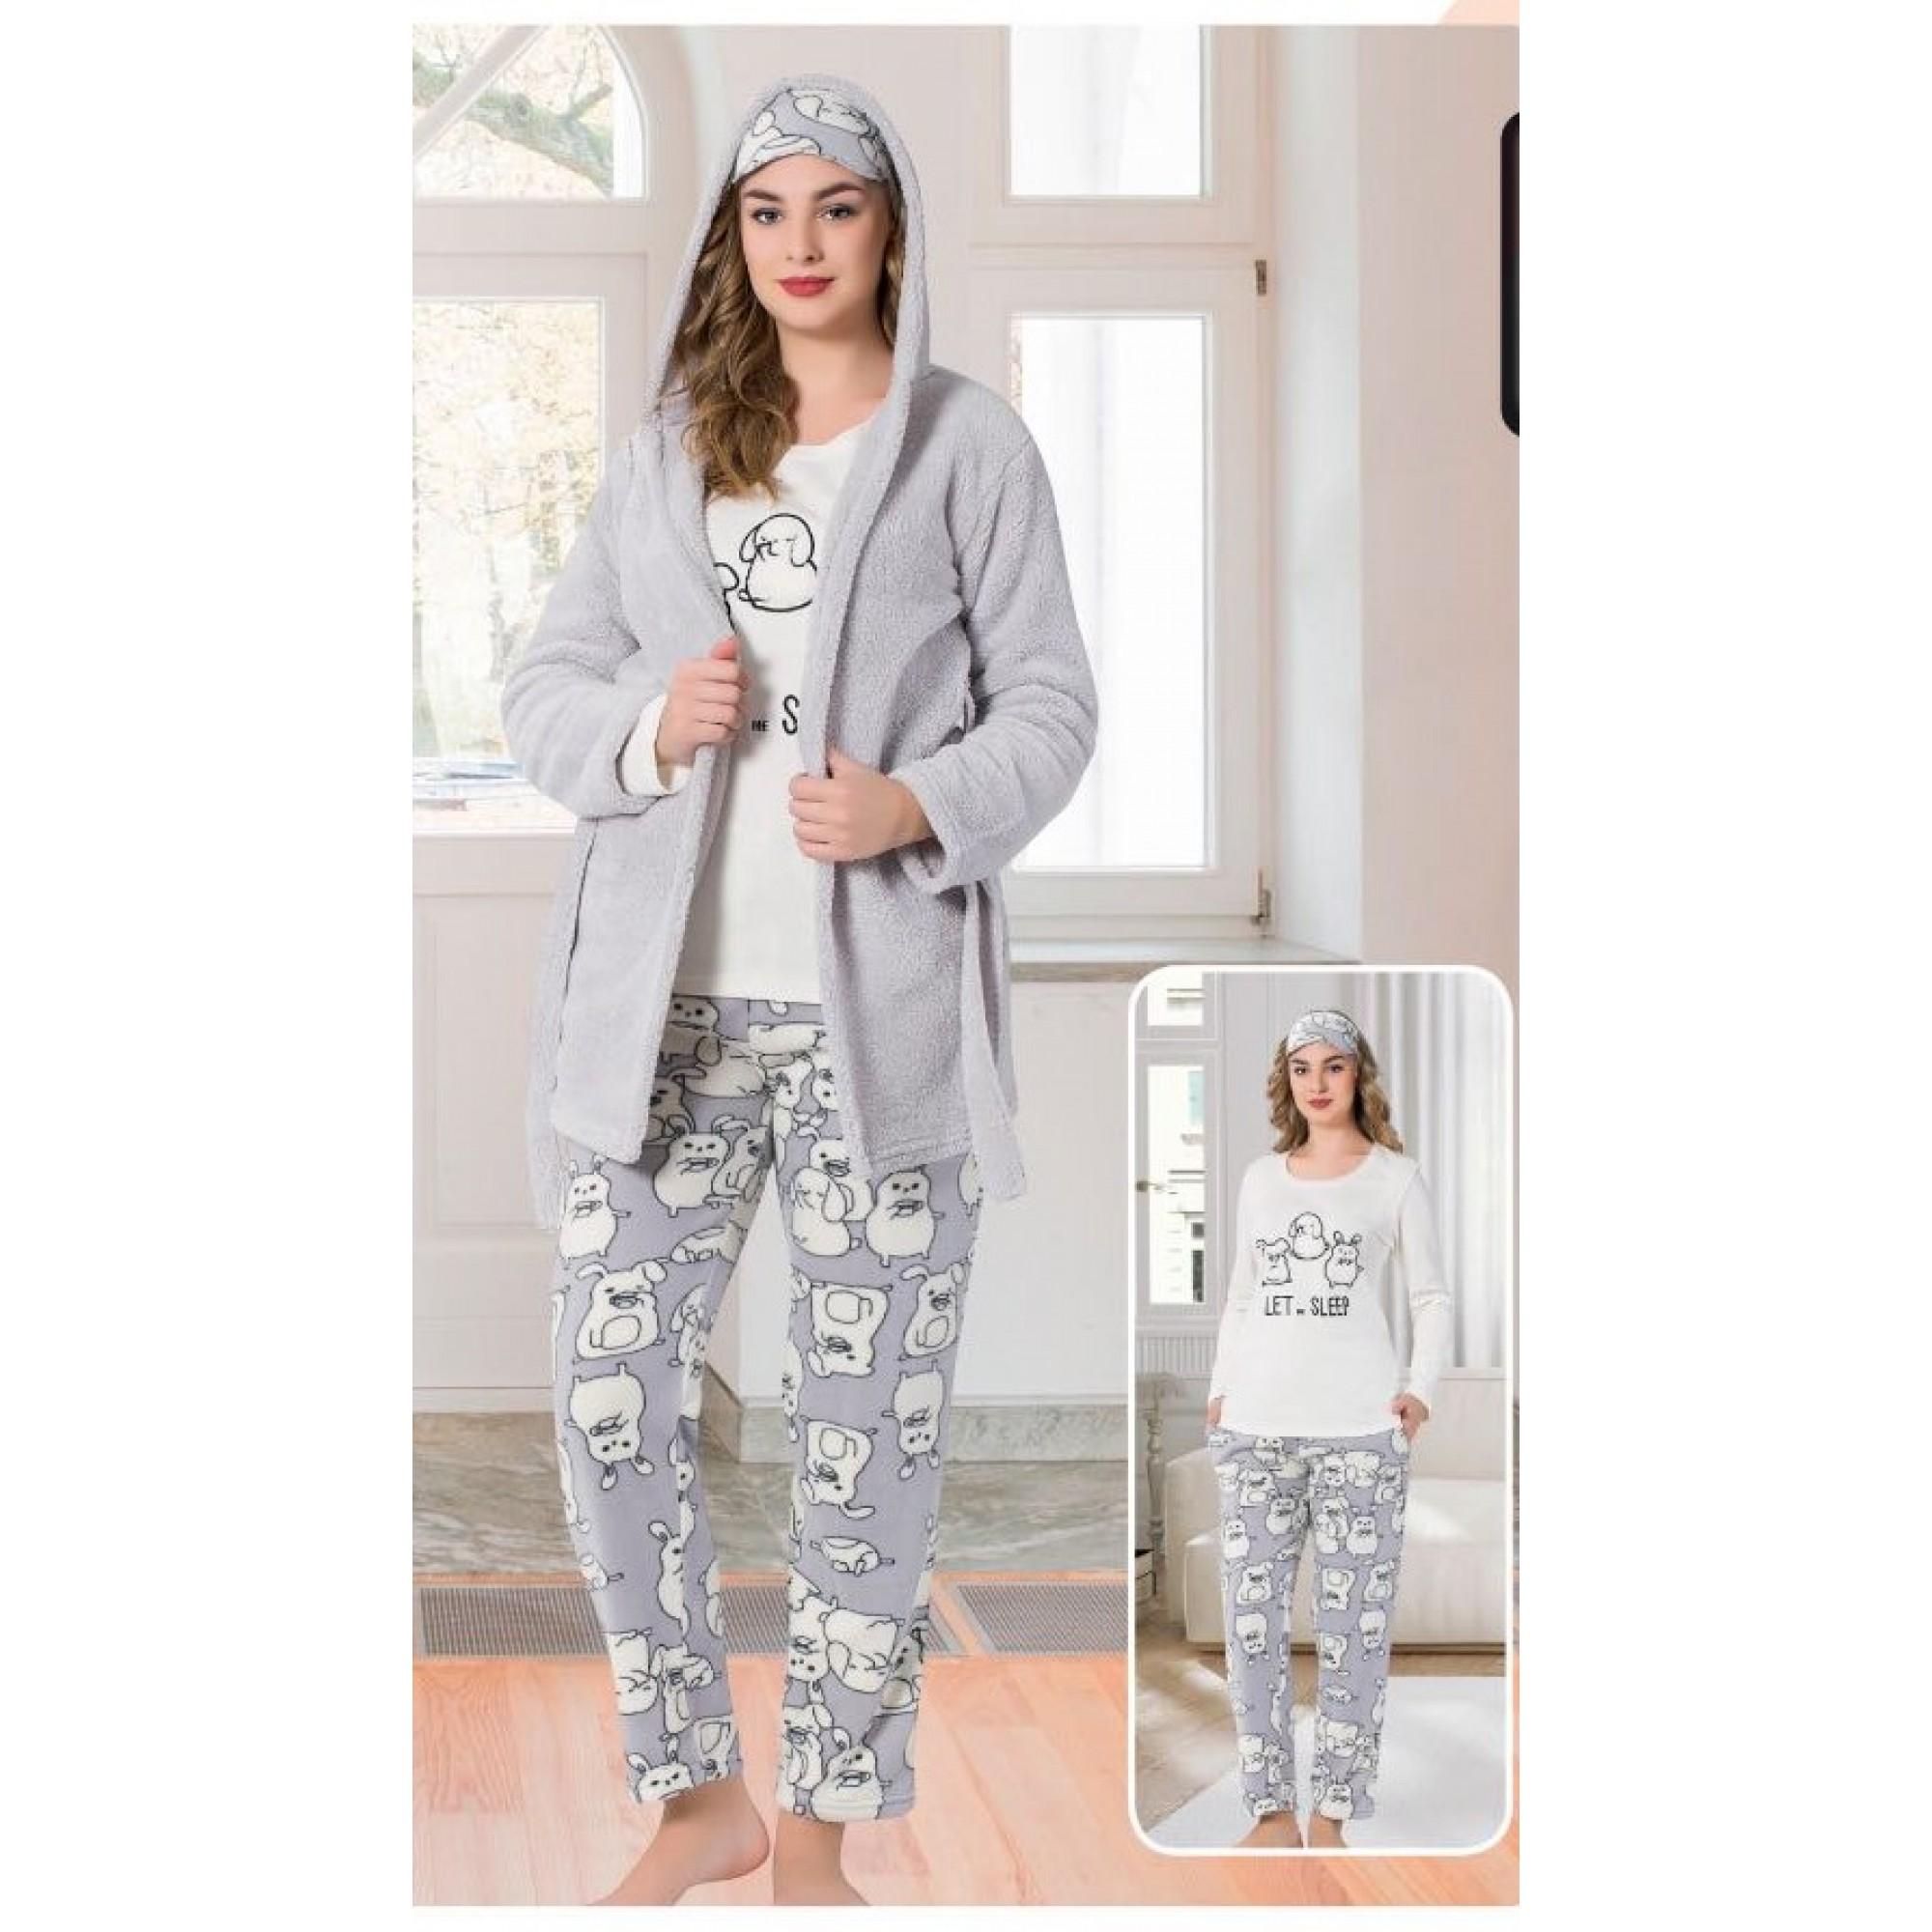 Дамска пижама  Bunny с домашен халат от мек полар